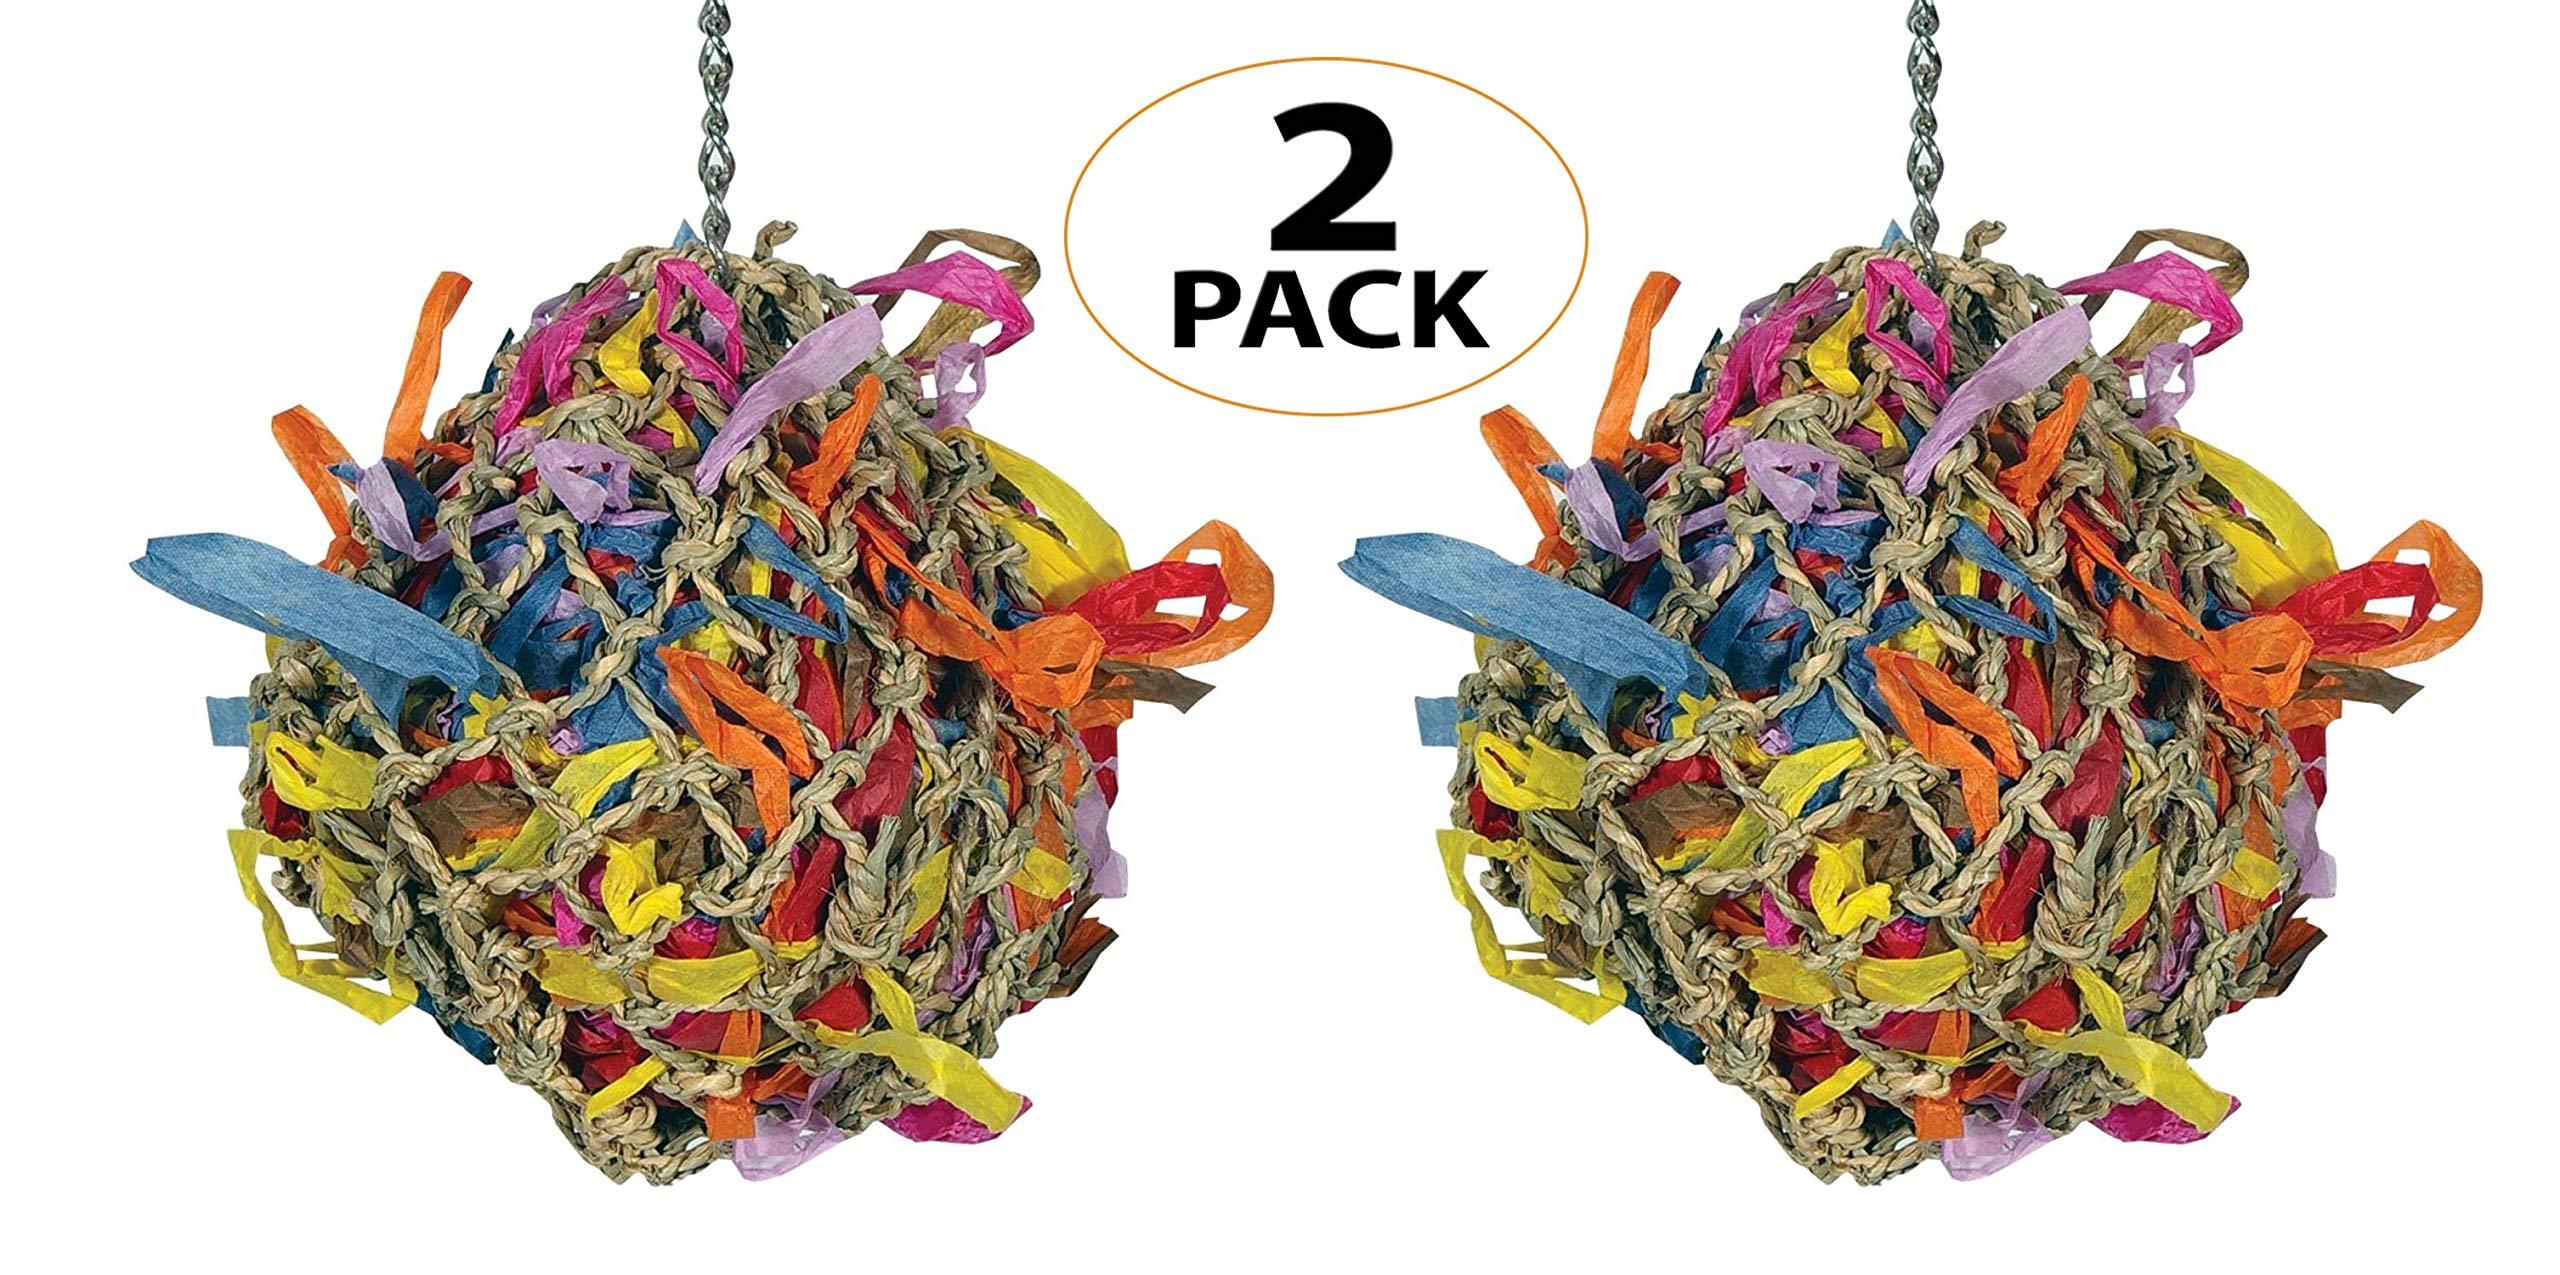 55100 Pk2 5 Inch Medium Super Shredder Ball Bird Toy Foraging Cages Birds Toys Parrot by Bonka Bird Toys